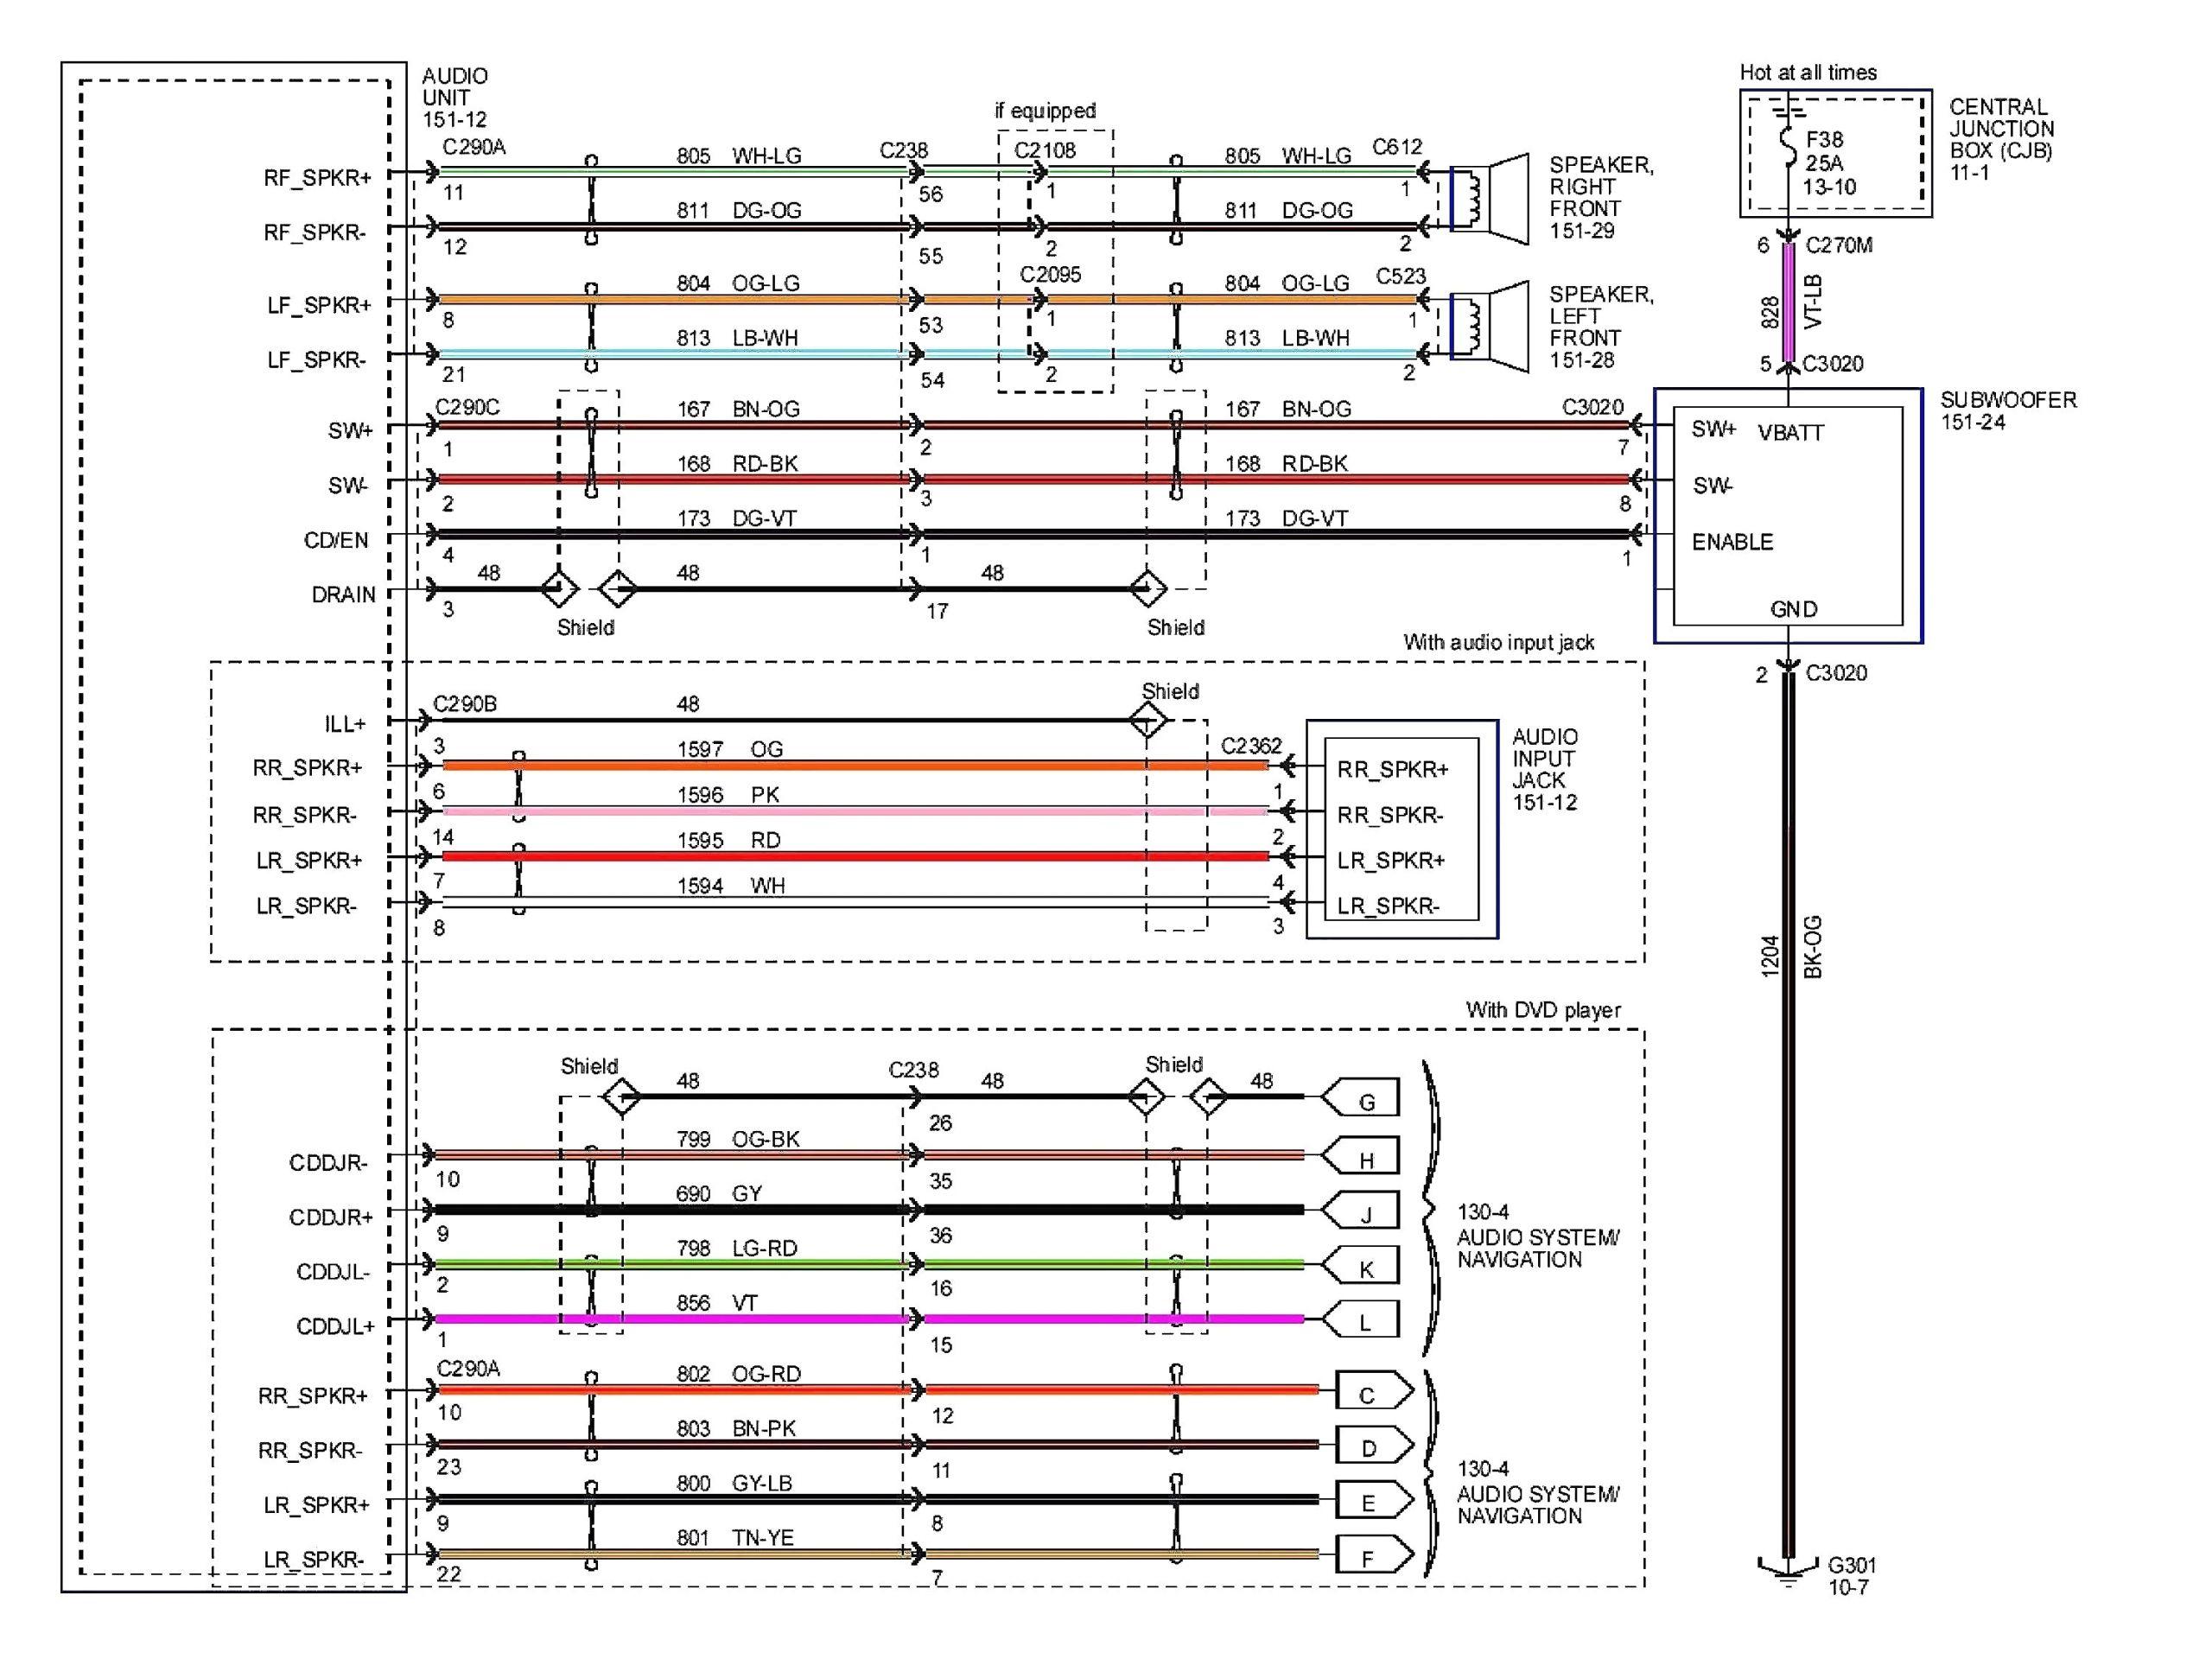 2001 honda civic radio wiring diagram pdf 1995 honda civic tow hook diagram blog wiring diagram of 2001 honda civic radio wiring diagram pdf jpg